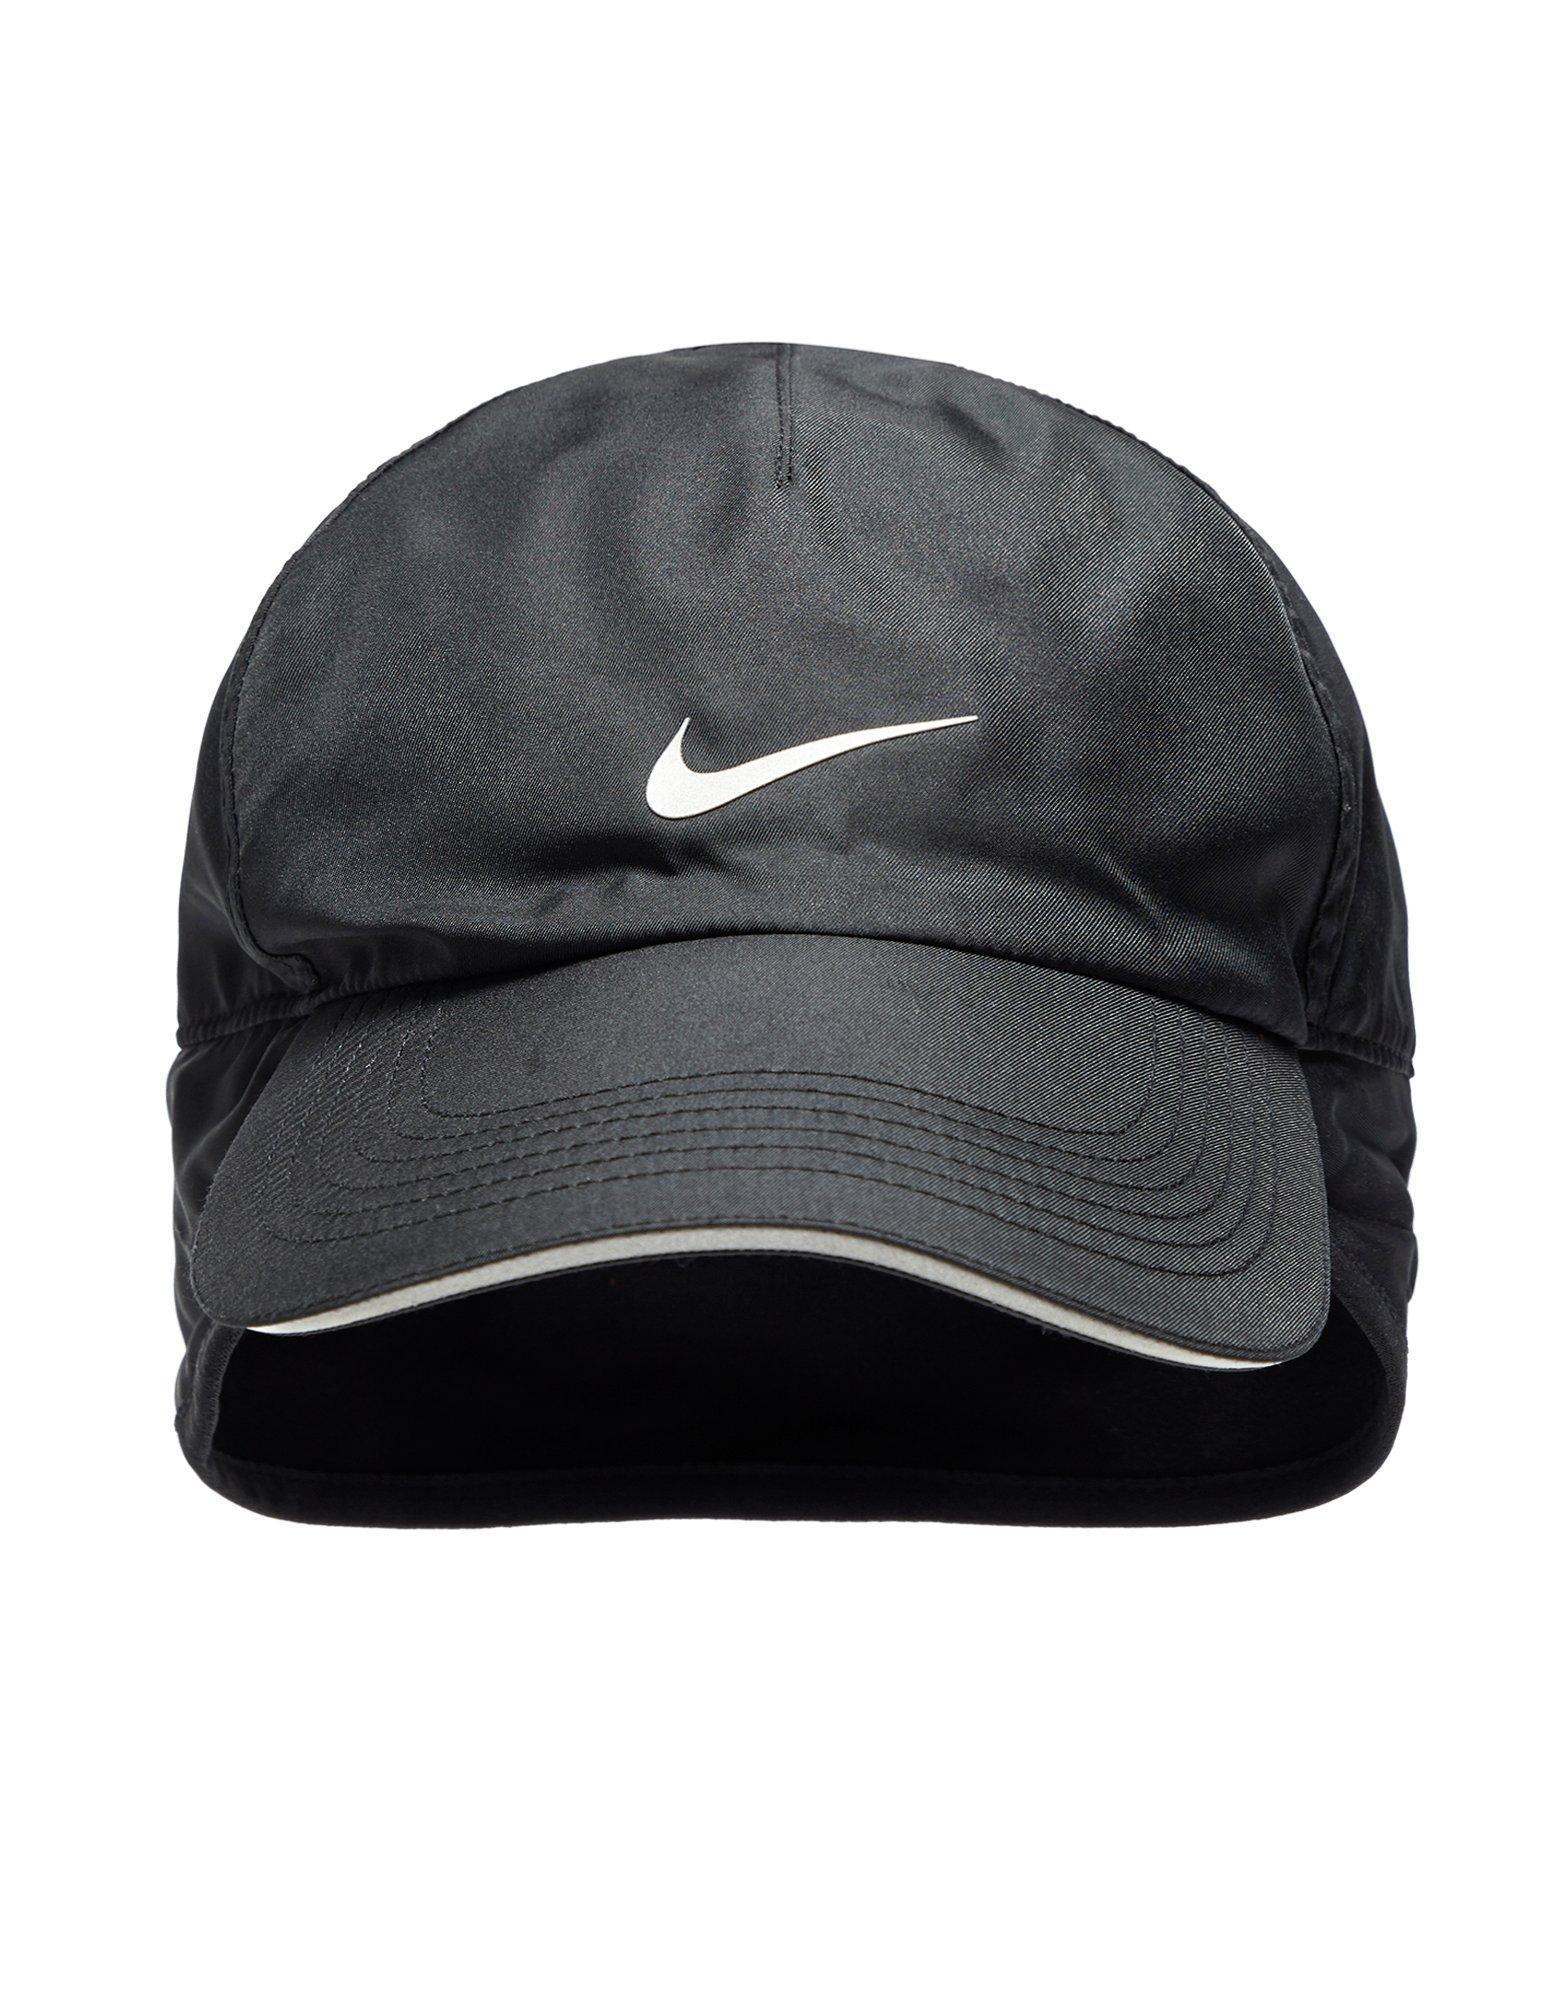 527fc170620 Nike H86 Aerobill Cap in Black for Men - Lyst